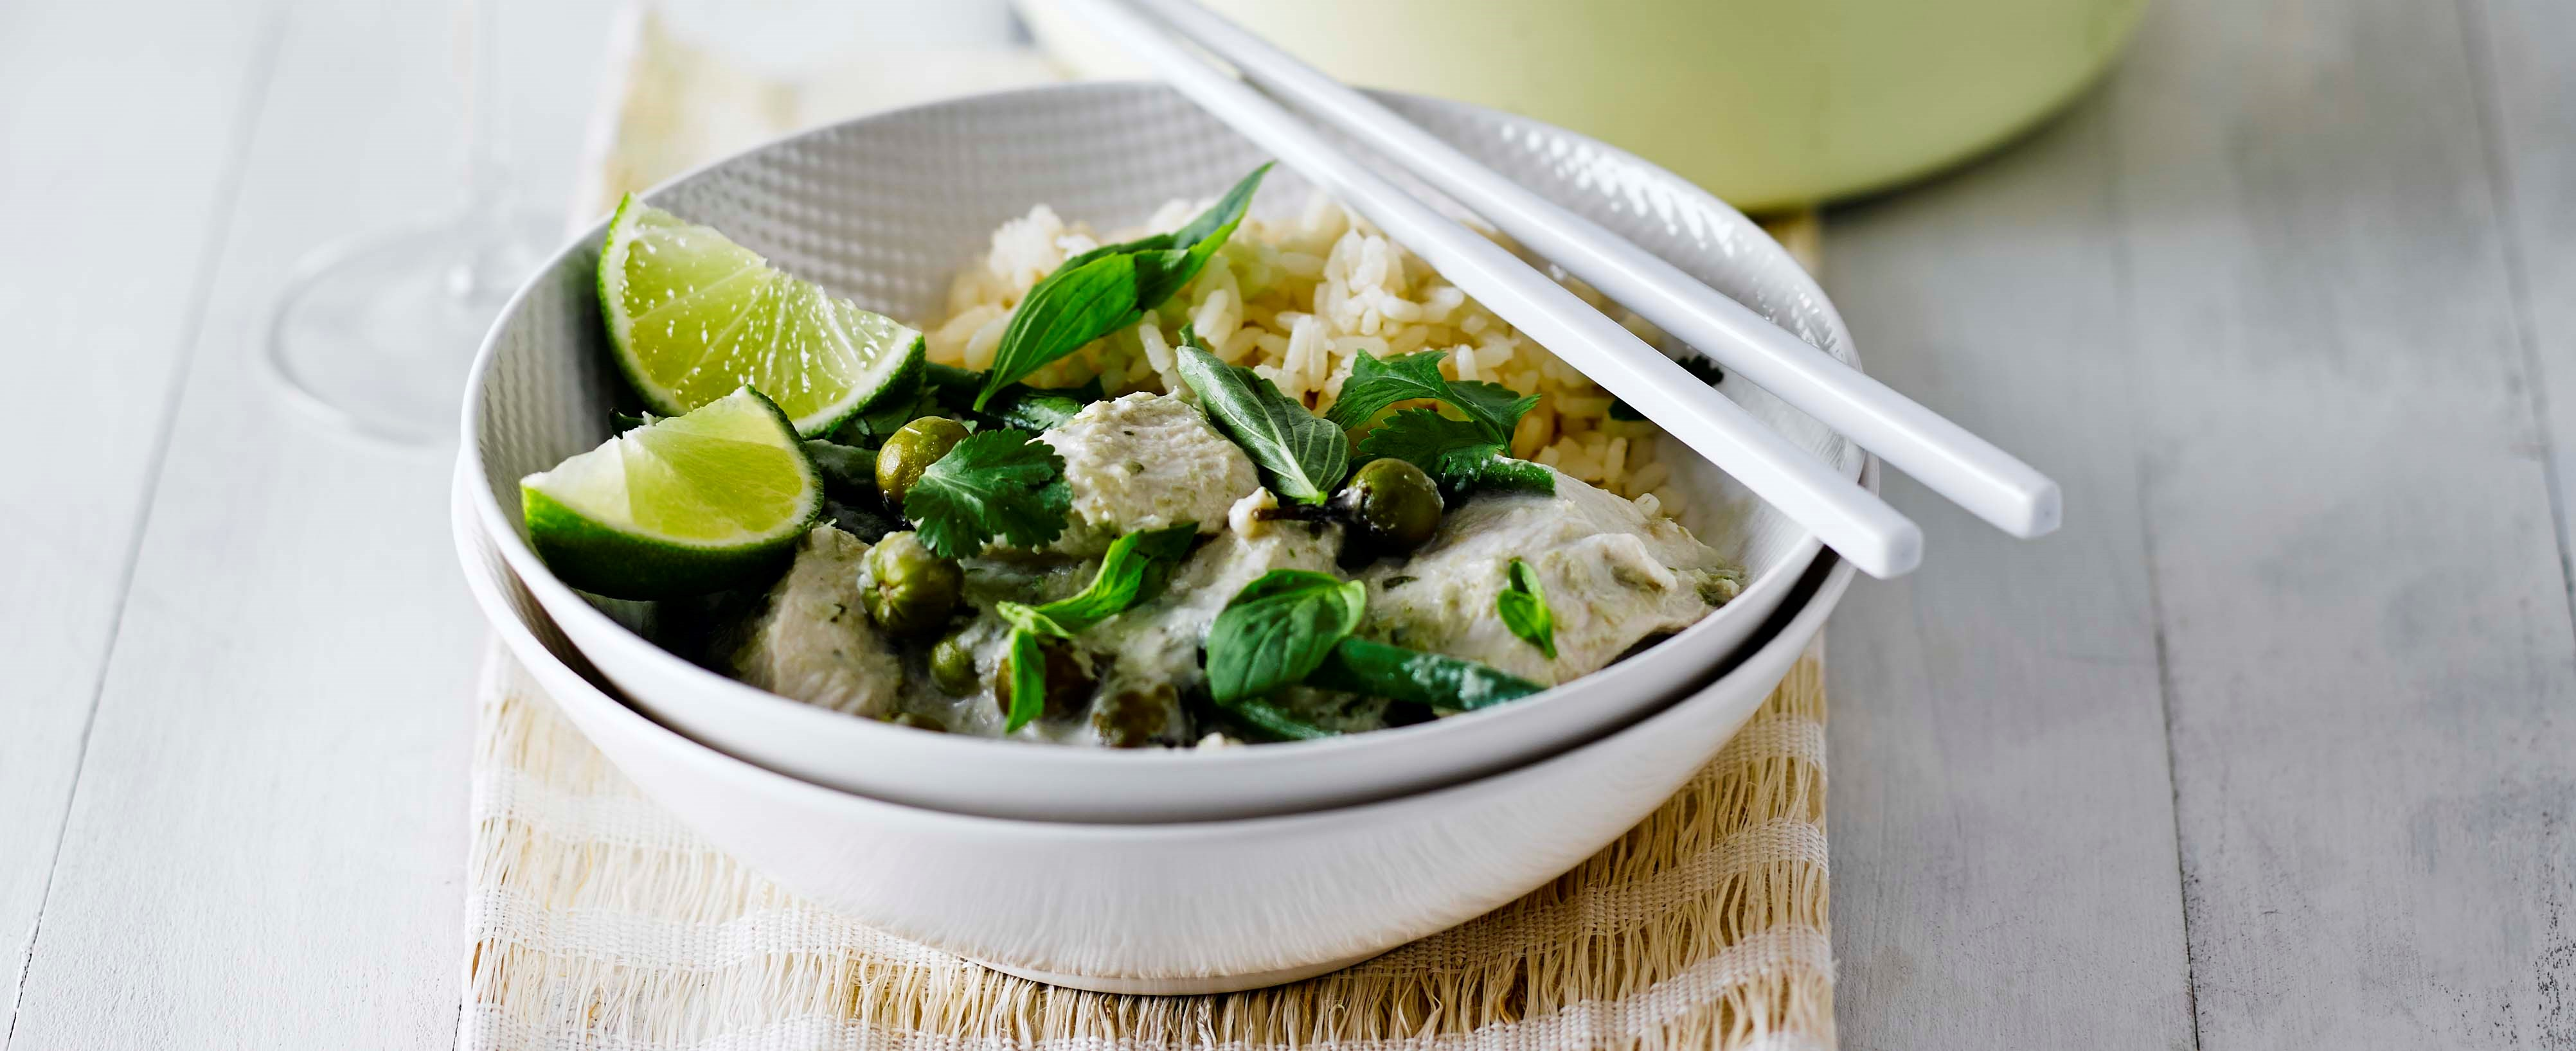 20 easy thai recipes olive magazine olive magazine best ever easy thai recipes forumfinder Choice Image